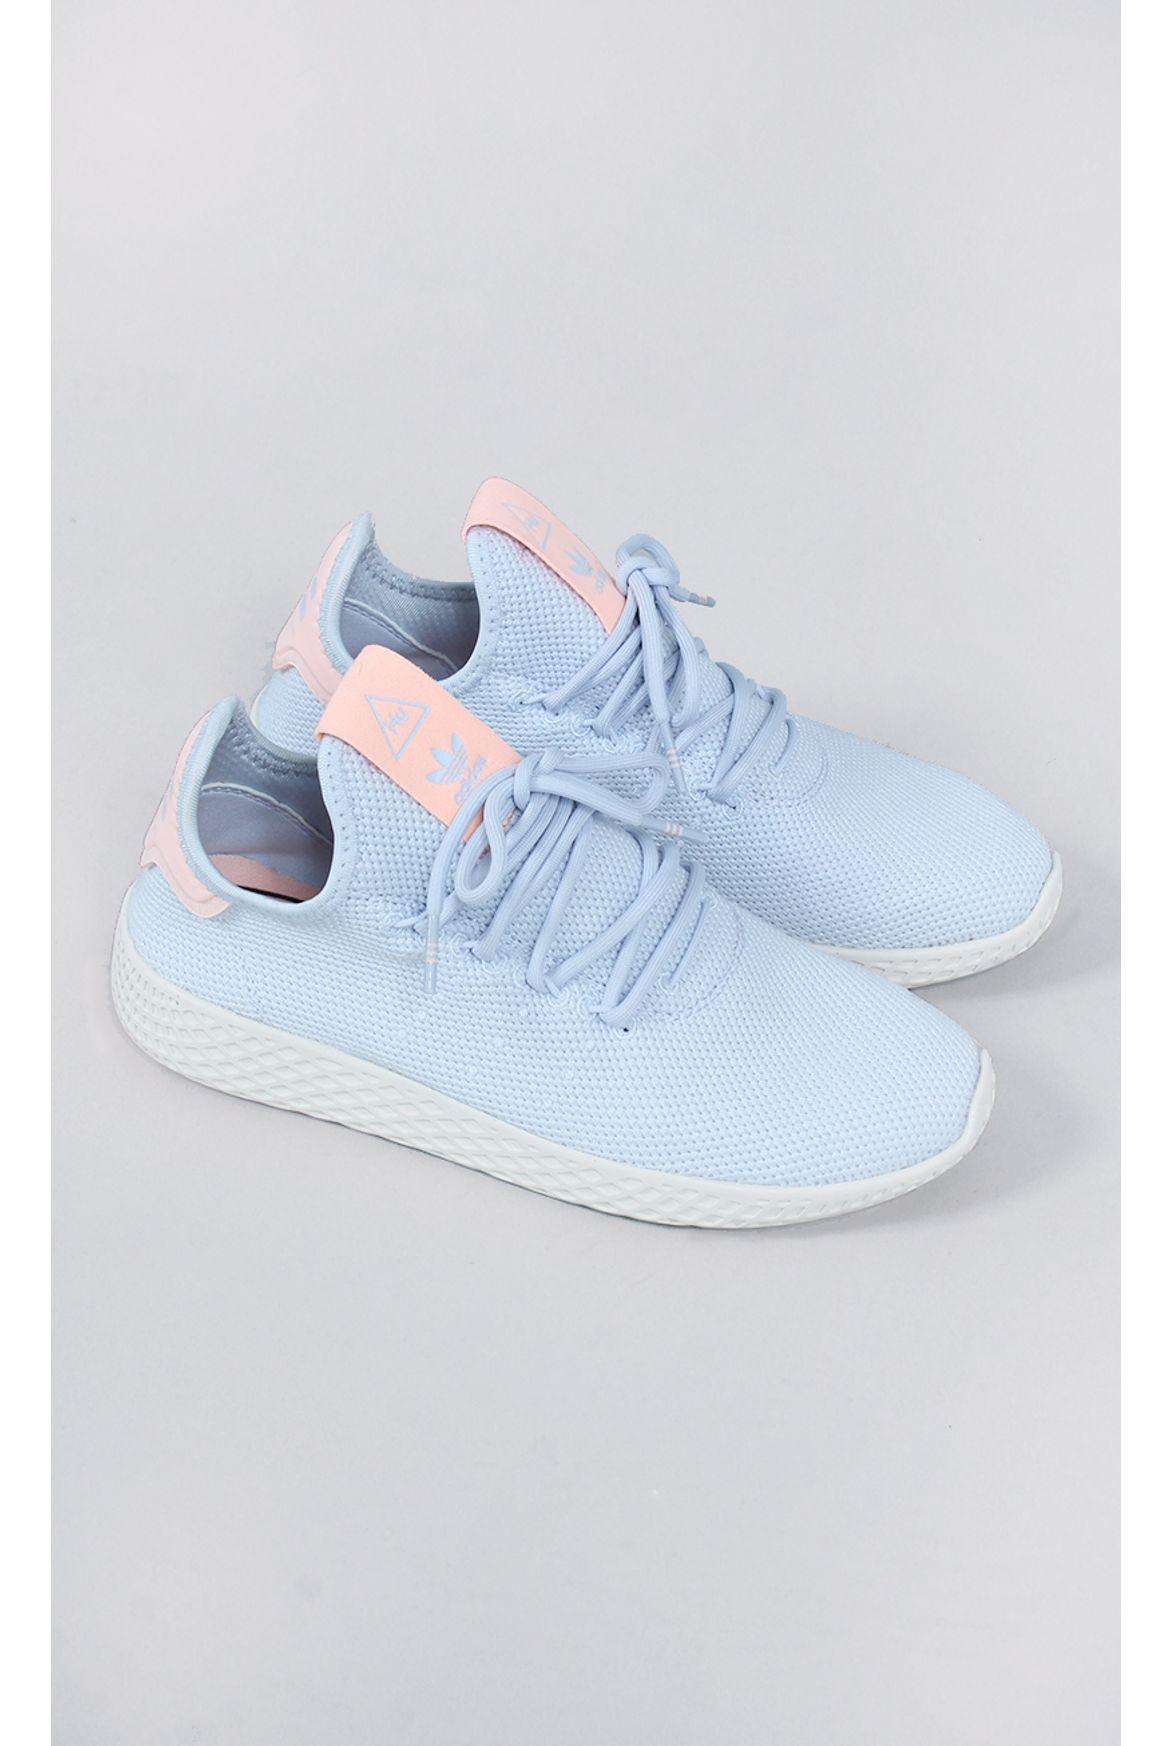 07ae53e4e31 FSHN tênis adidas pw hu w azul - Fashion Closet